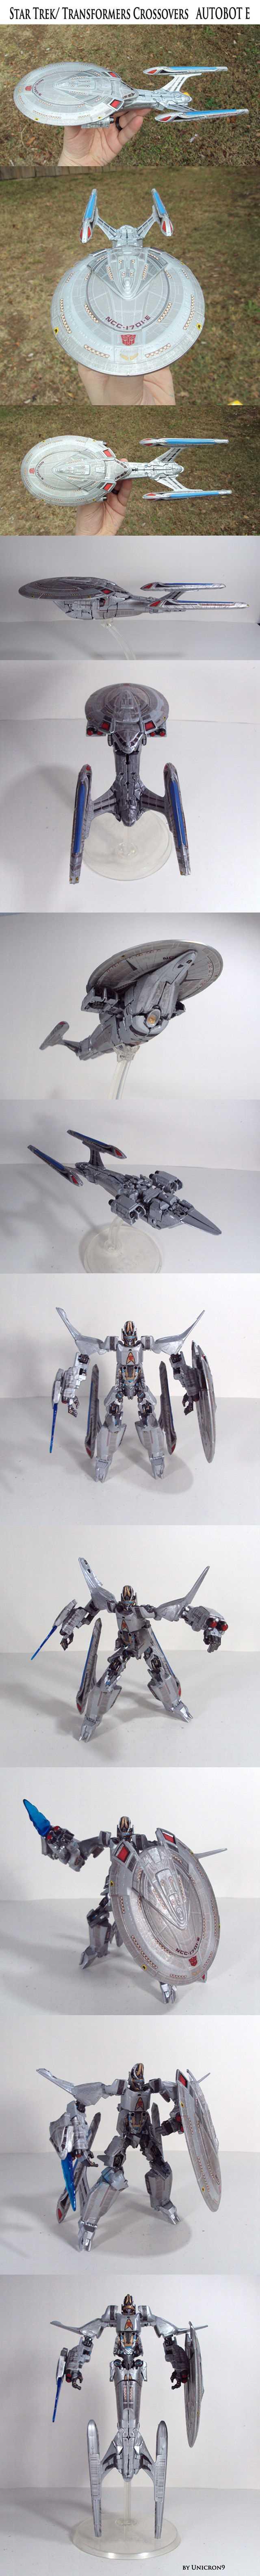 uss-enterprise-transformer